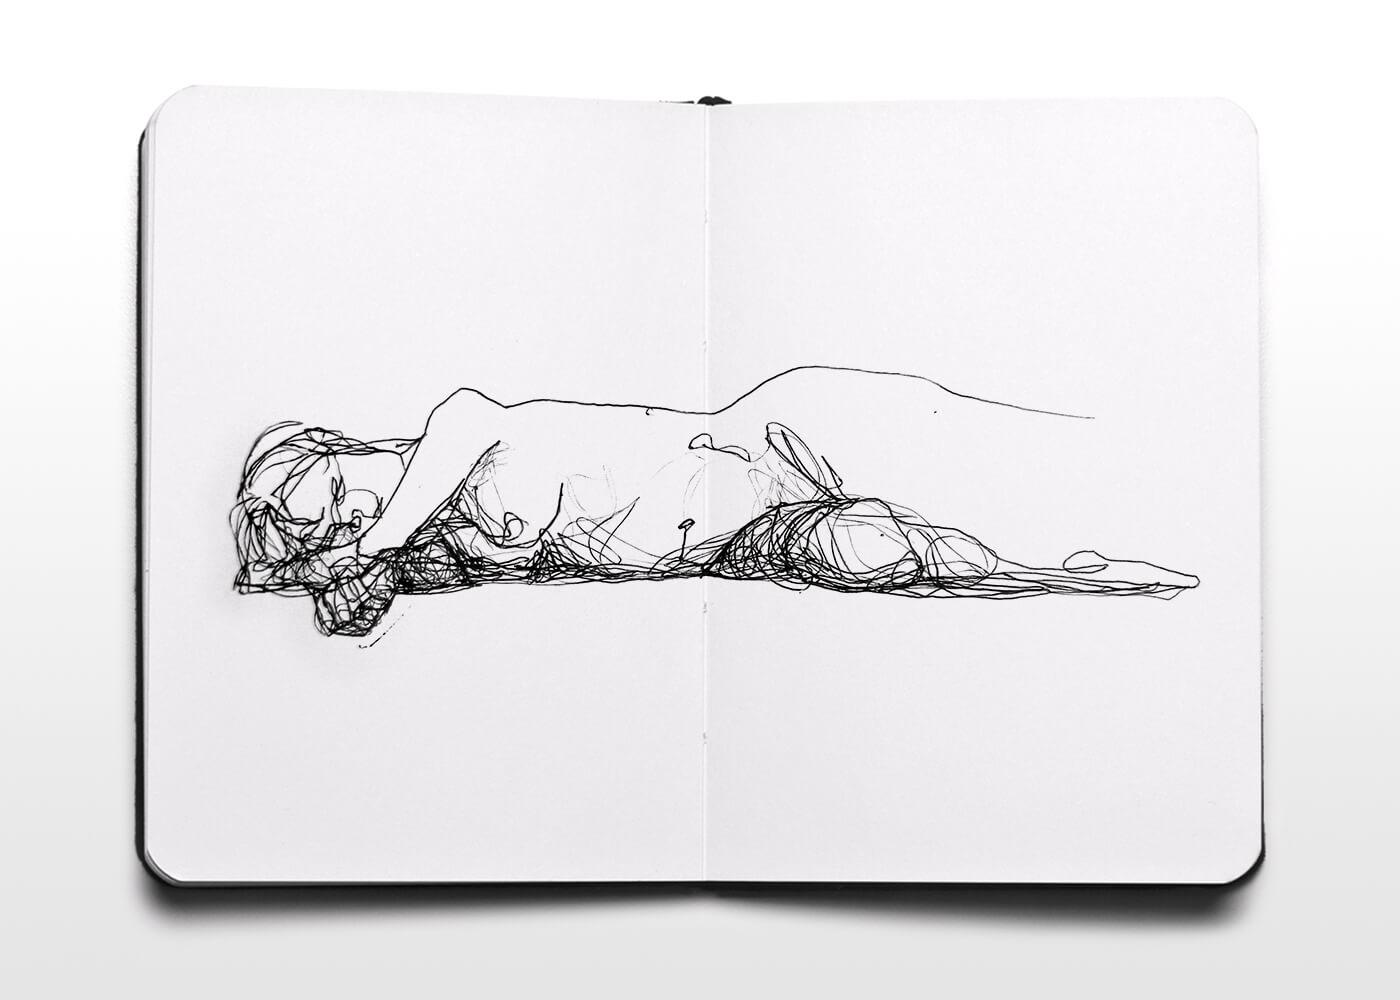 Boceto De Mujer Desnuda 1 - Sketch Of Naked Woman 1